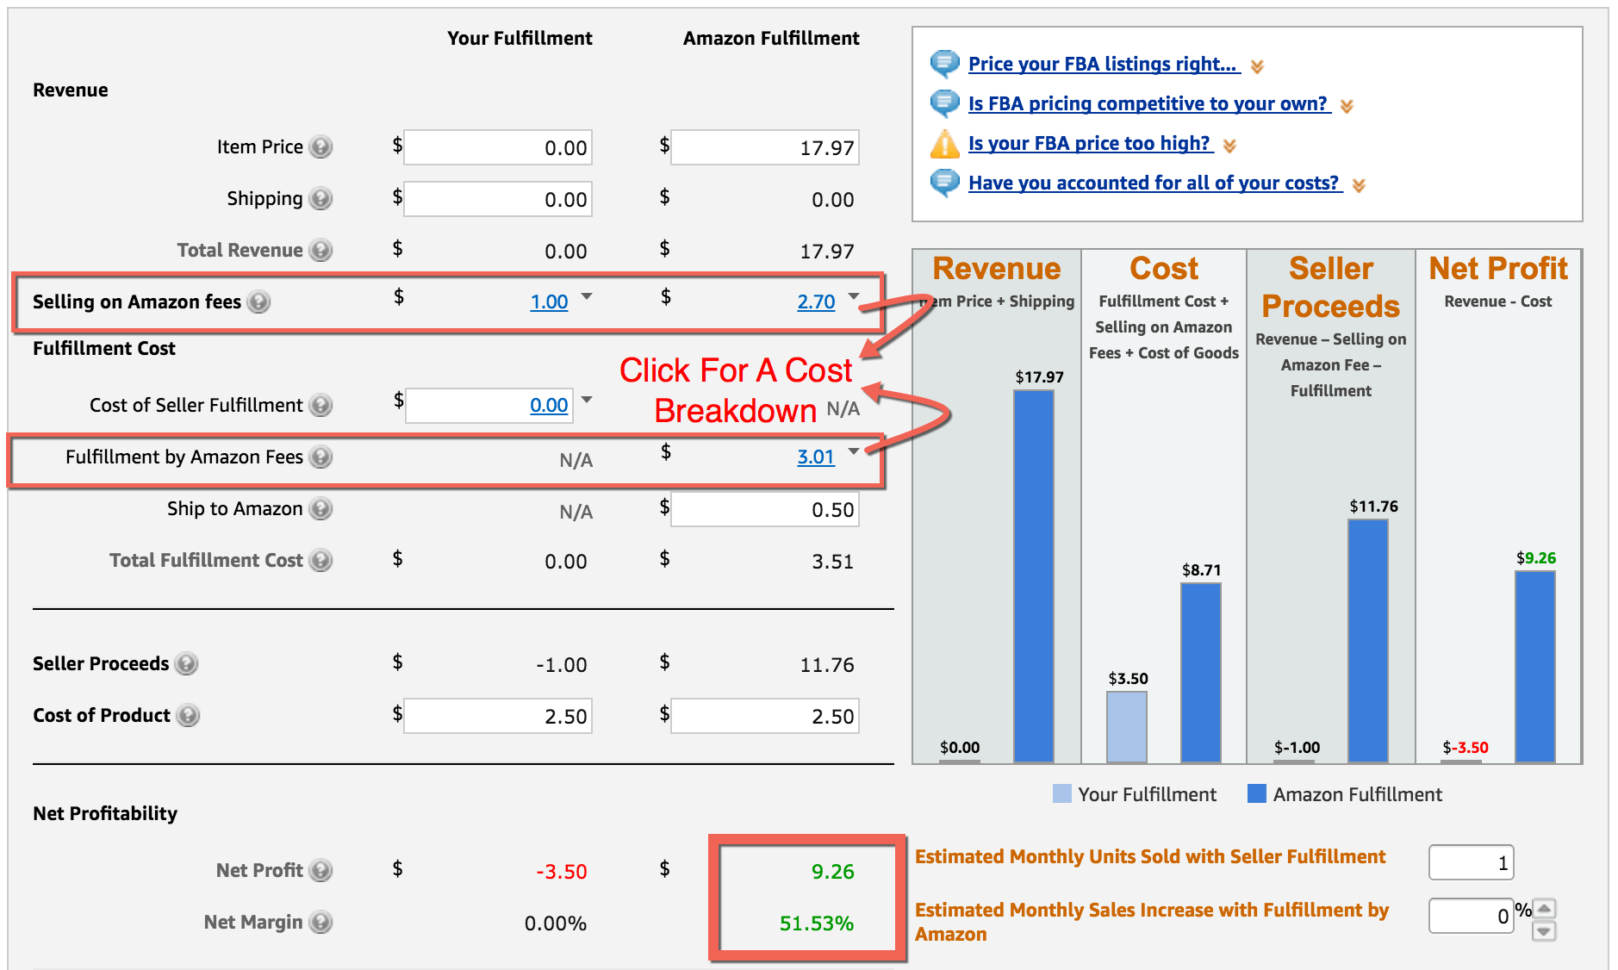 Amazon Profit Spreadsheet Regarding Fba Calculator: Free Tool To Calculate Amazon Fees, Profit  Revenue